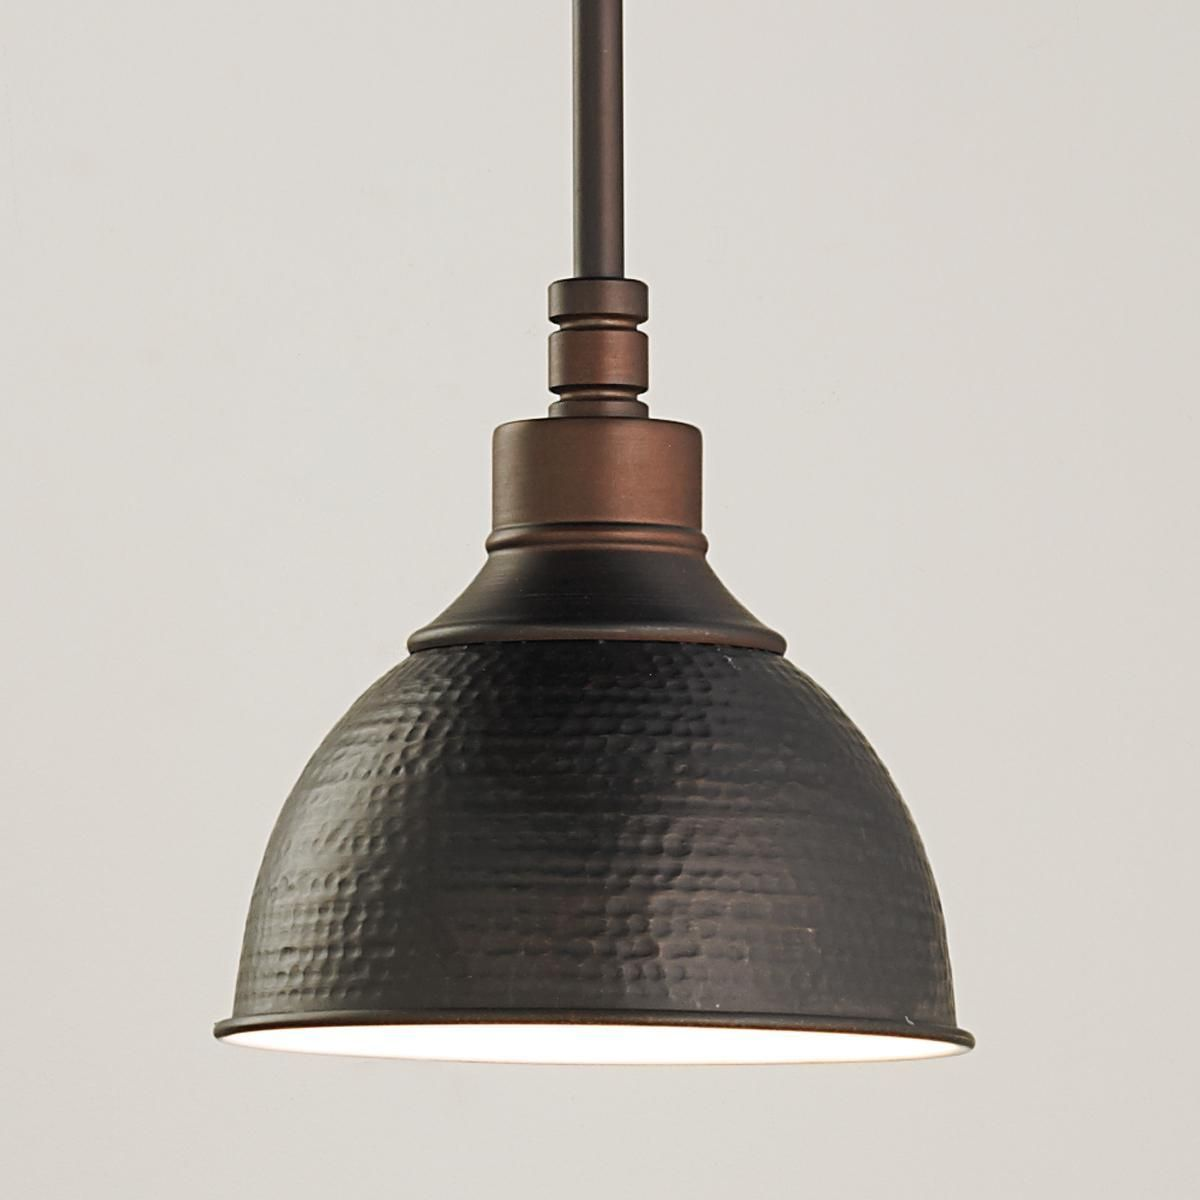 Hammered Metal Pendant Light Small Metal Pendant Light Small Pendant Lights Copper Pendant Lights